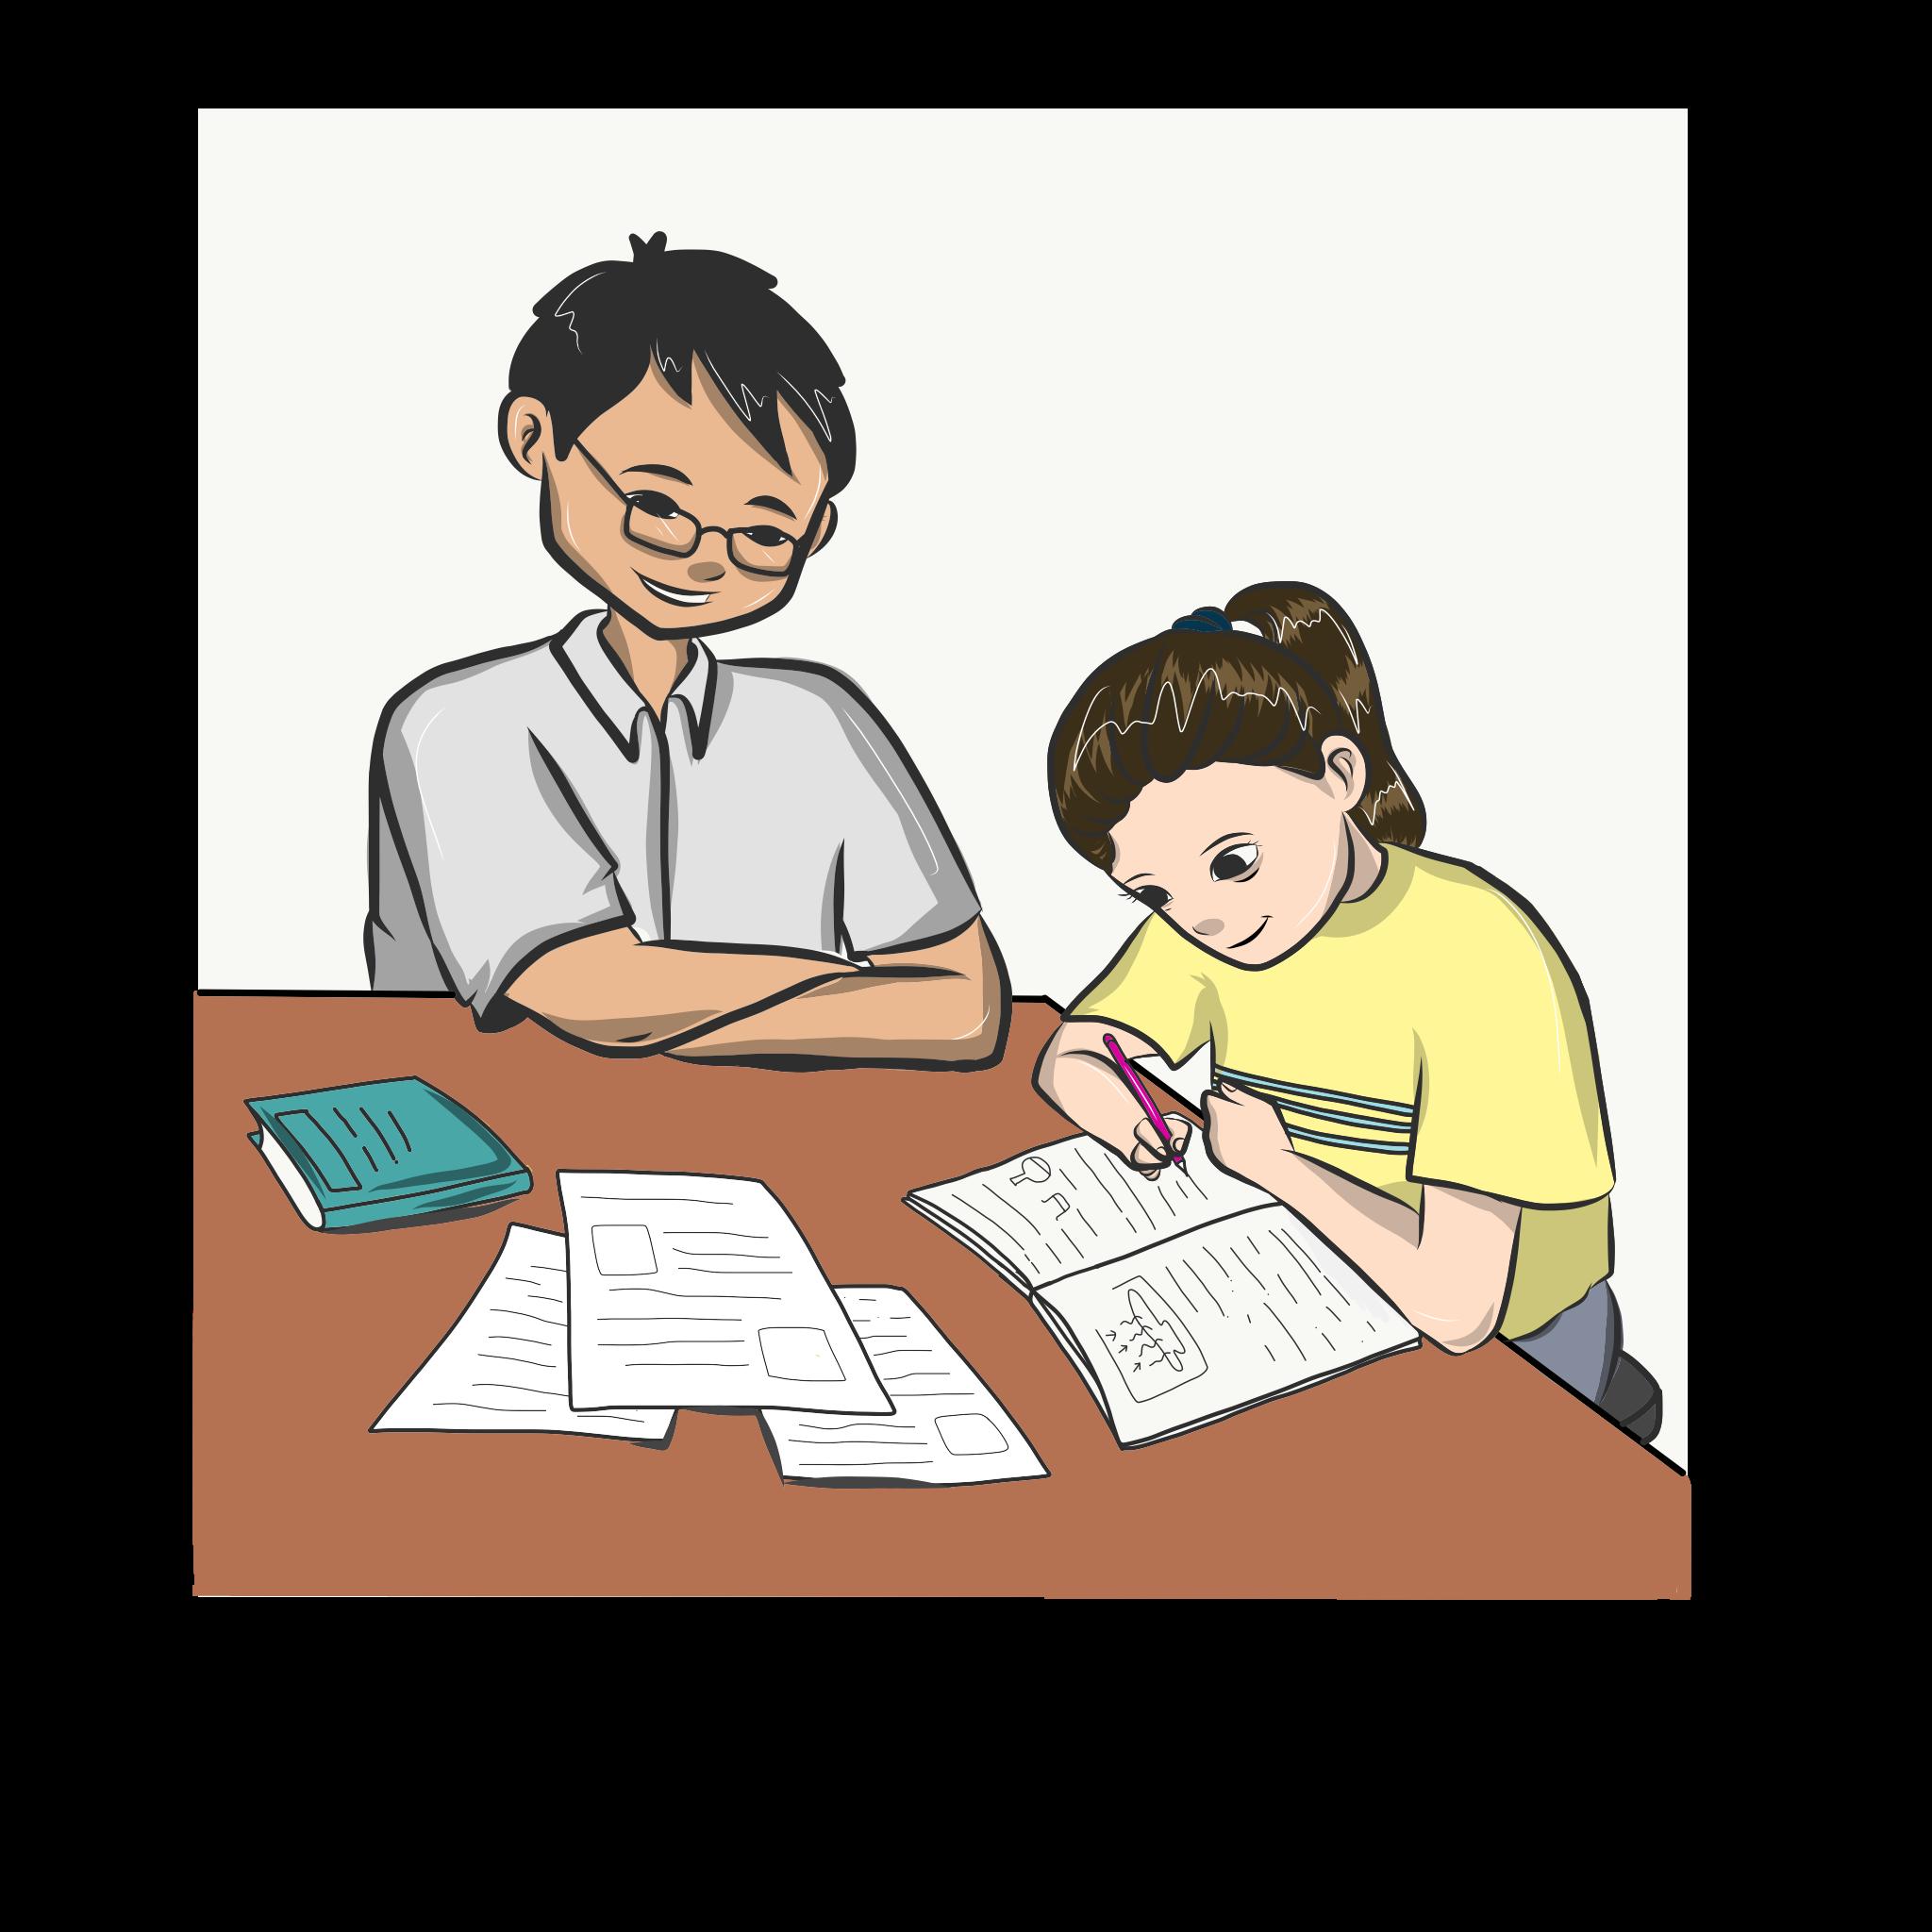 Teach clipart tutoring. Mmtutors best service in